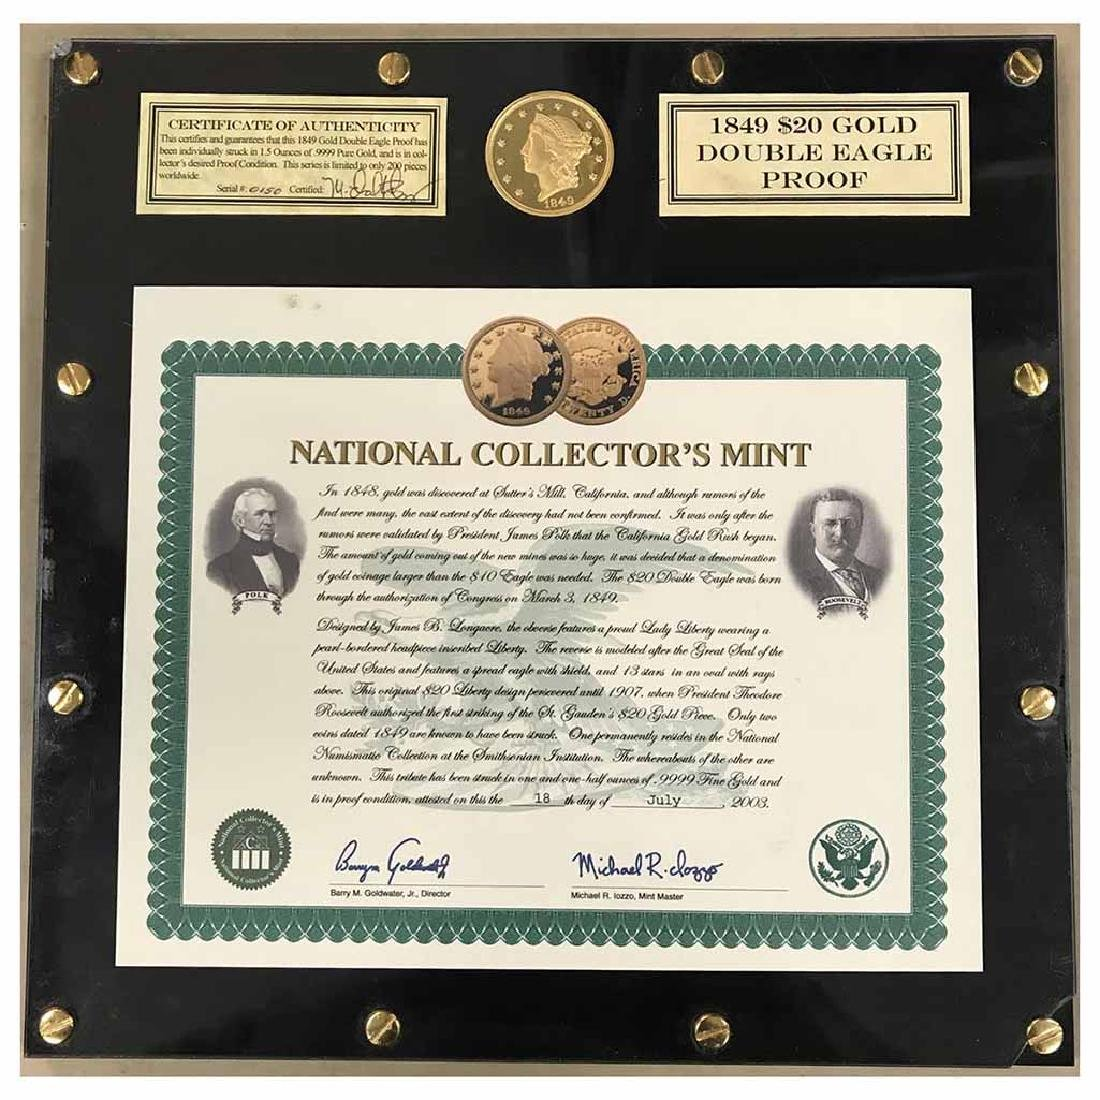 1849 $20 Gold Double Eagle Proof Replica 1.5 oz.